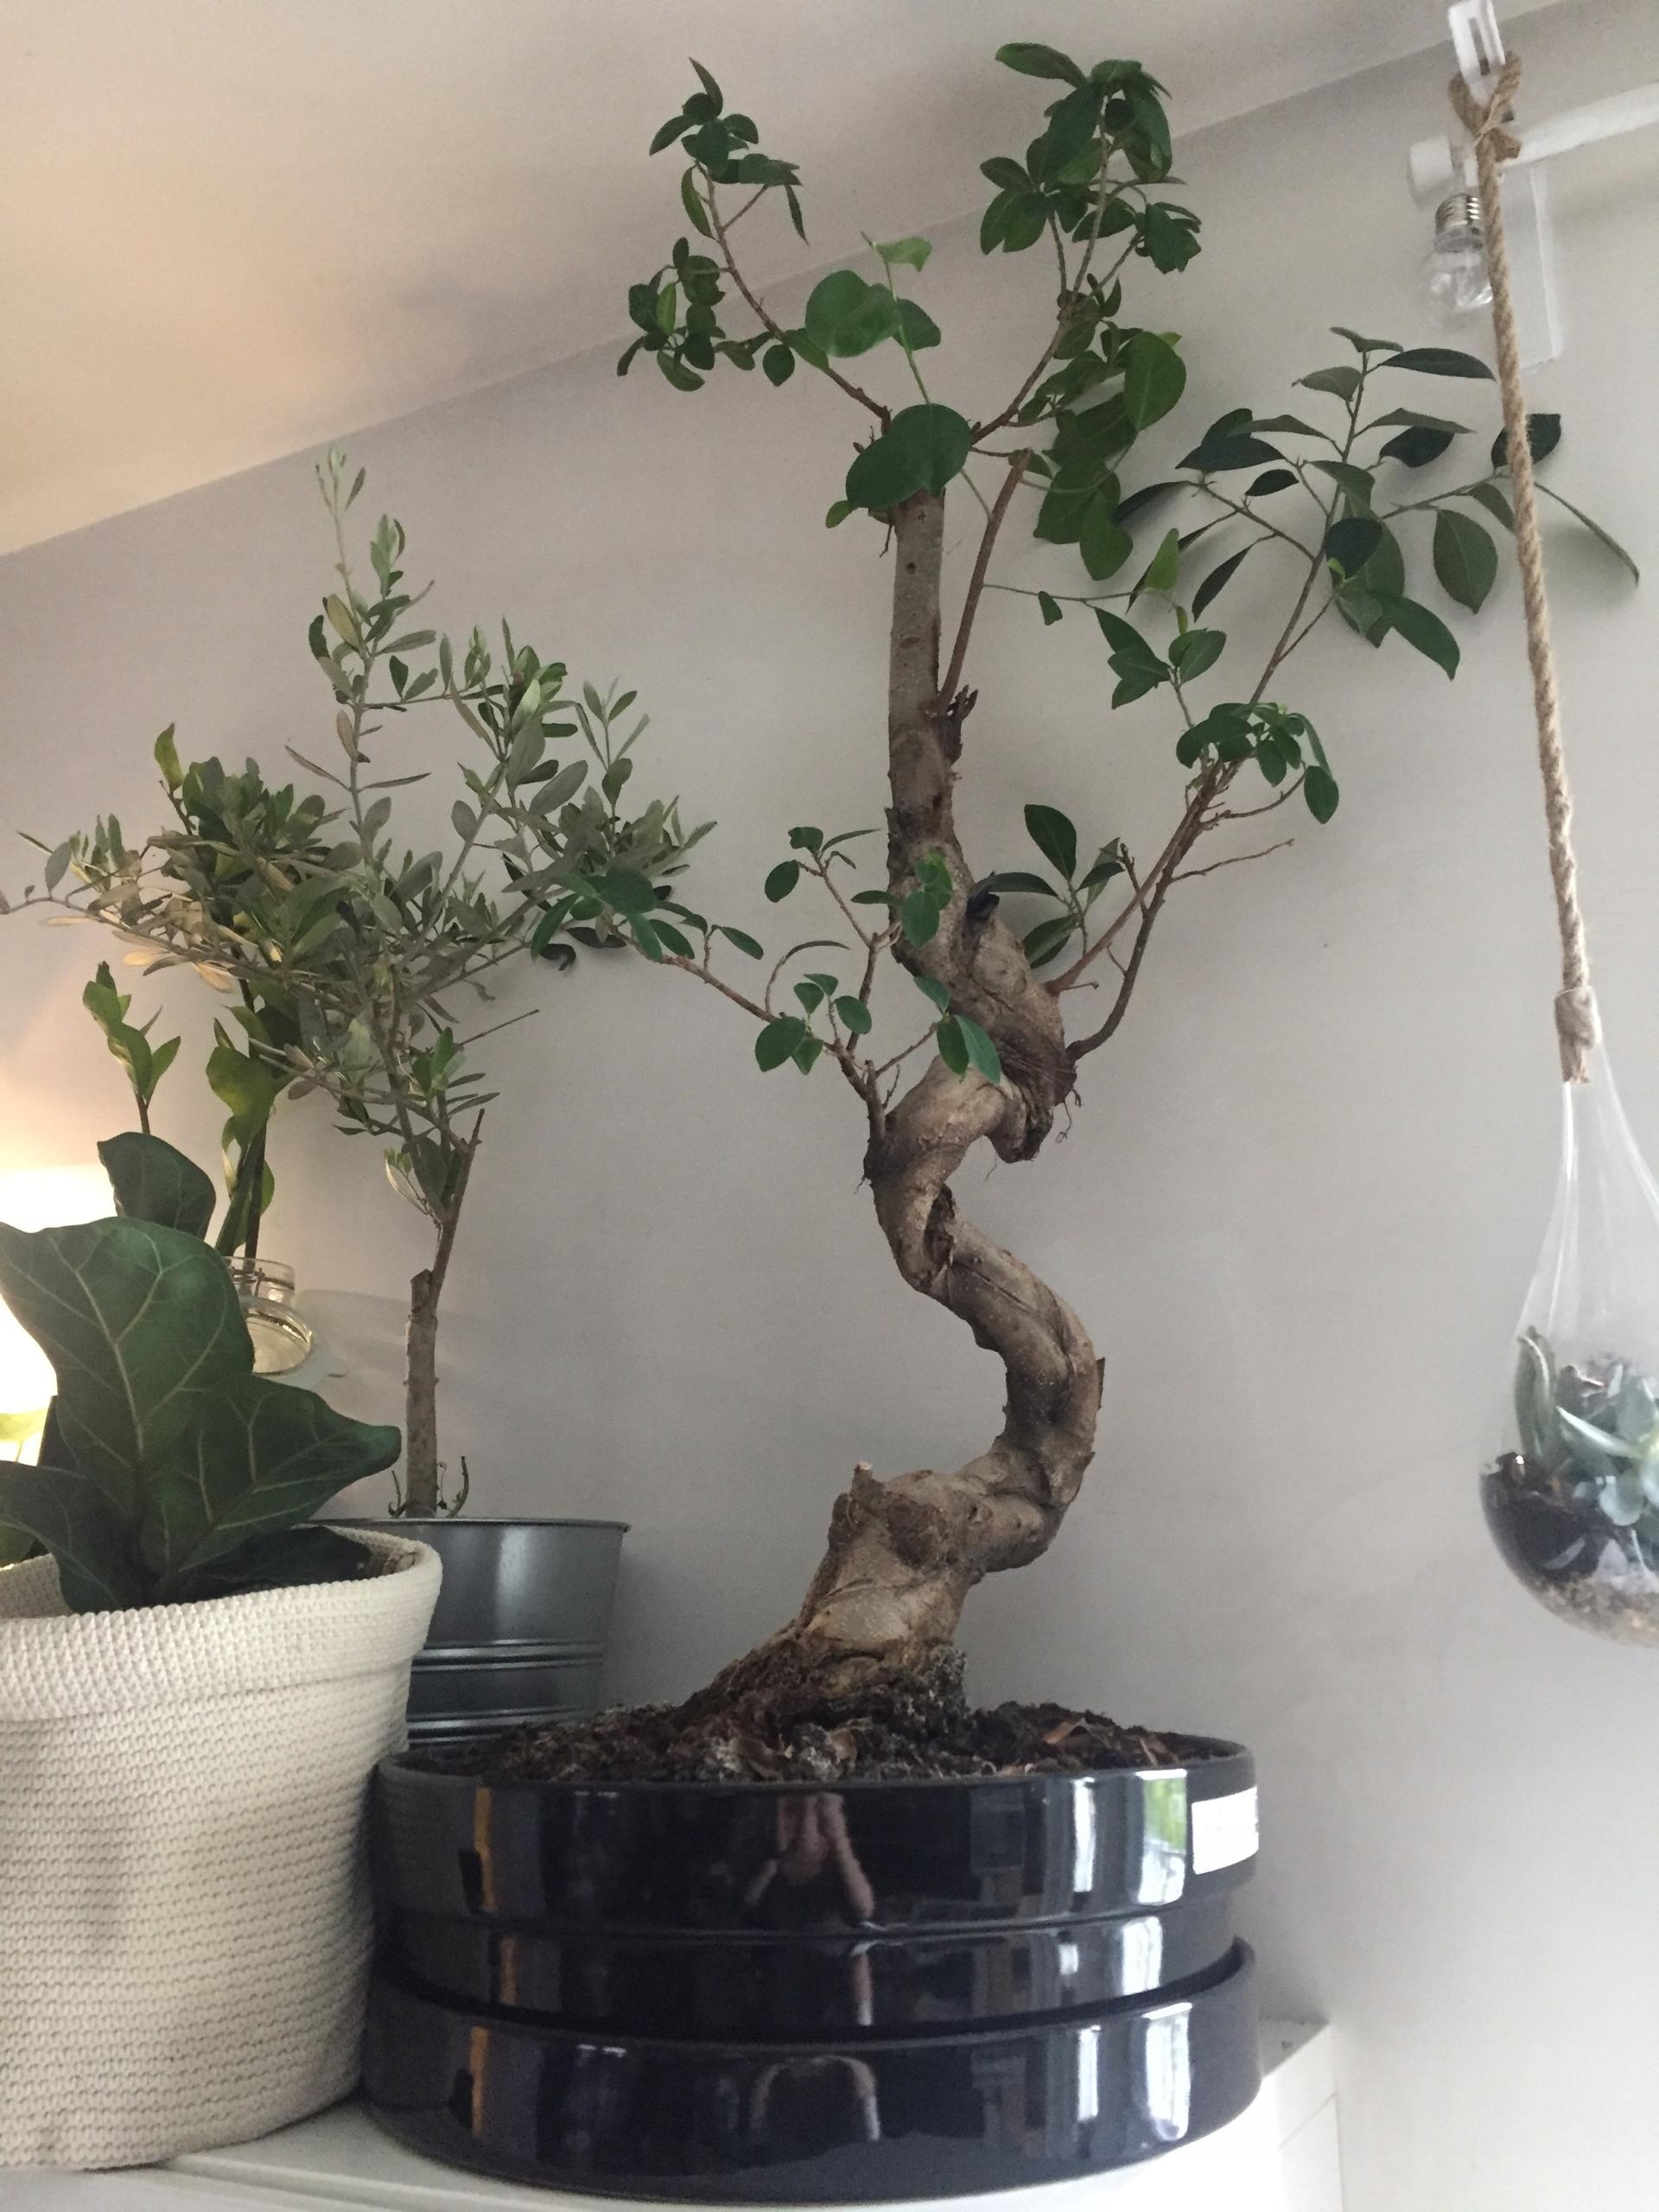 Ficus Bonsai Microcarpa Ginseng Ikea Tanio 8083519158